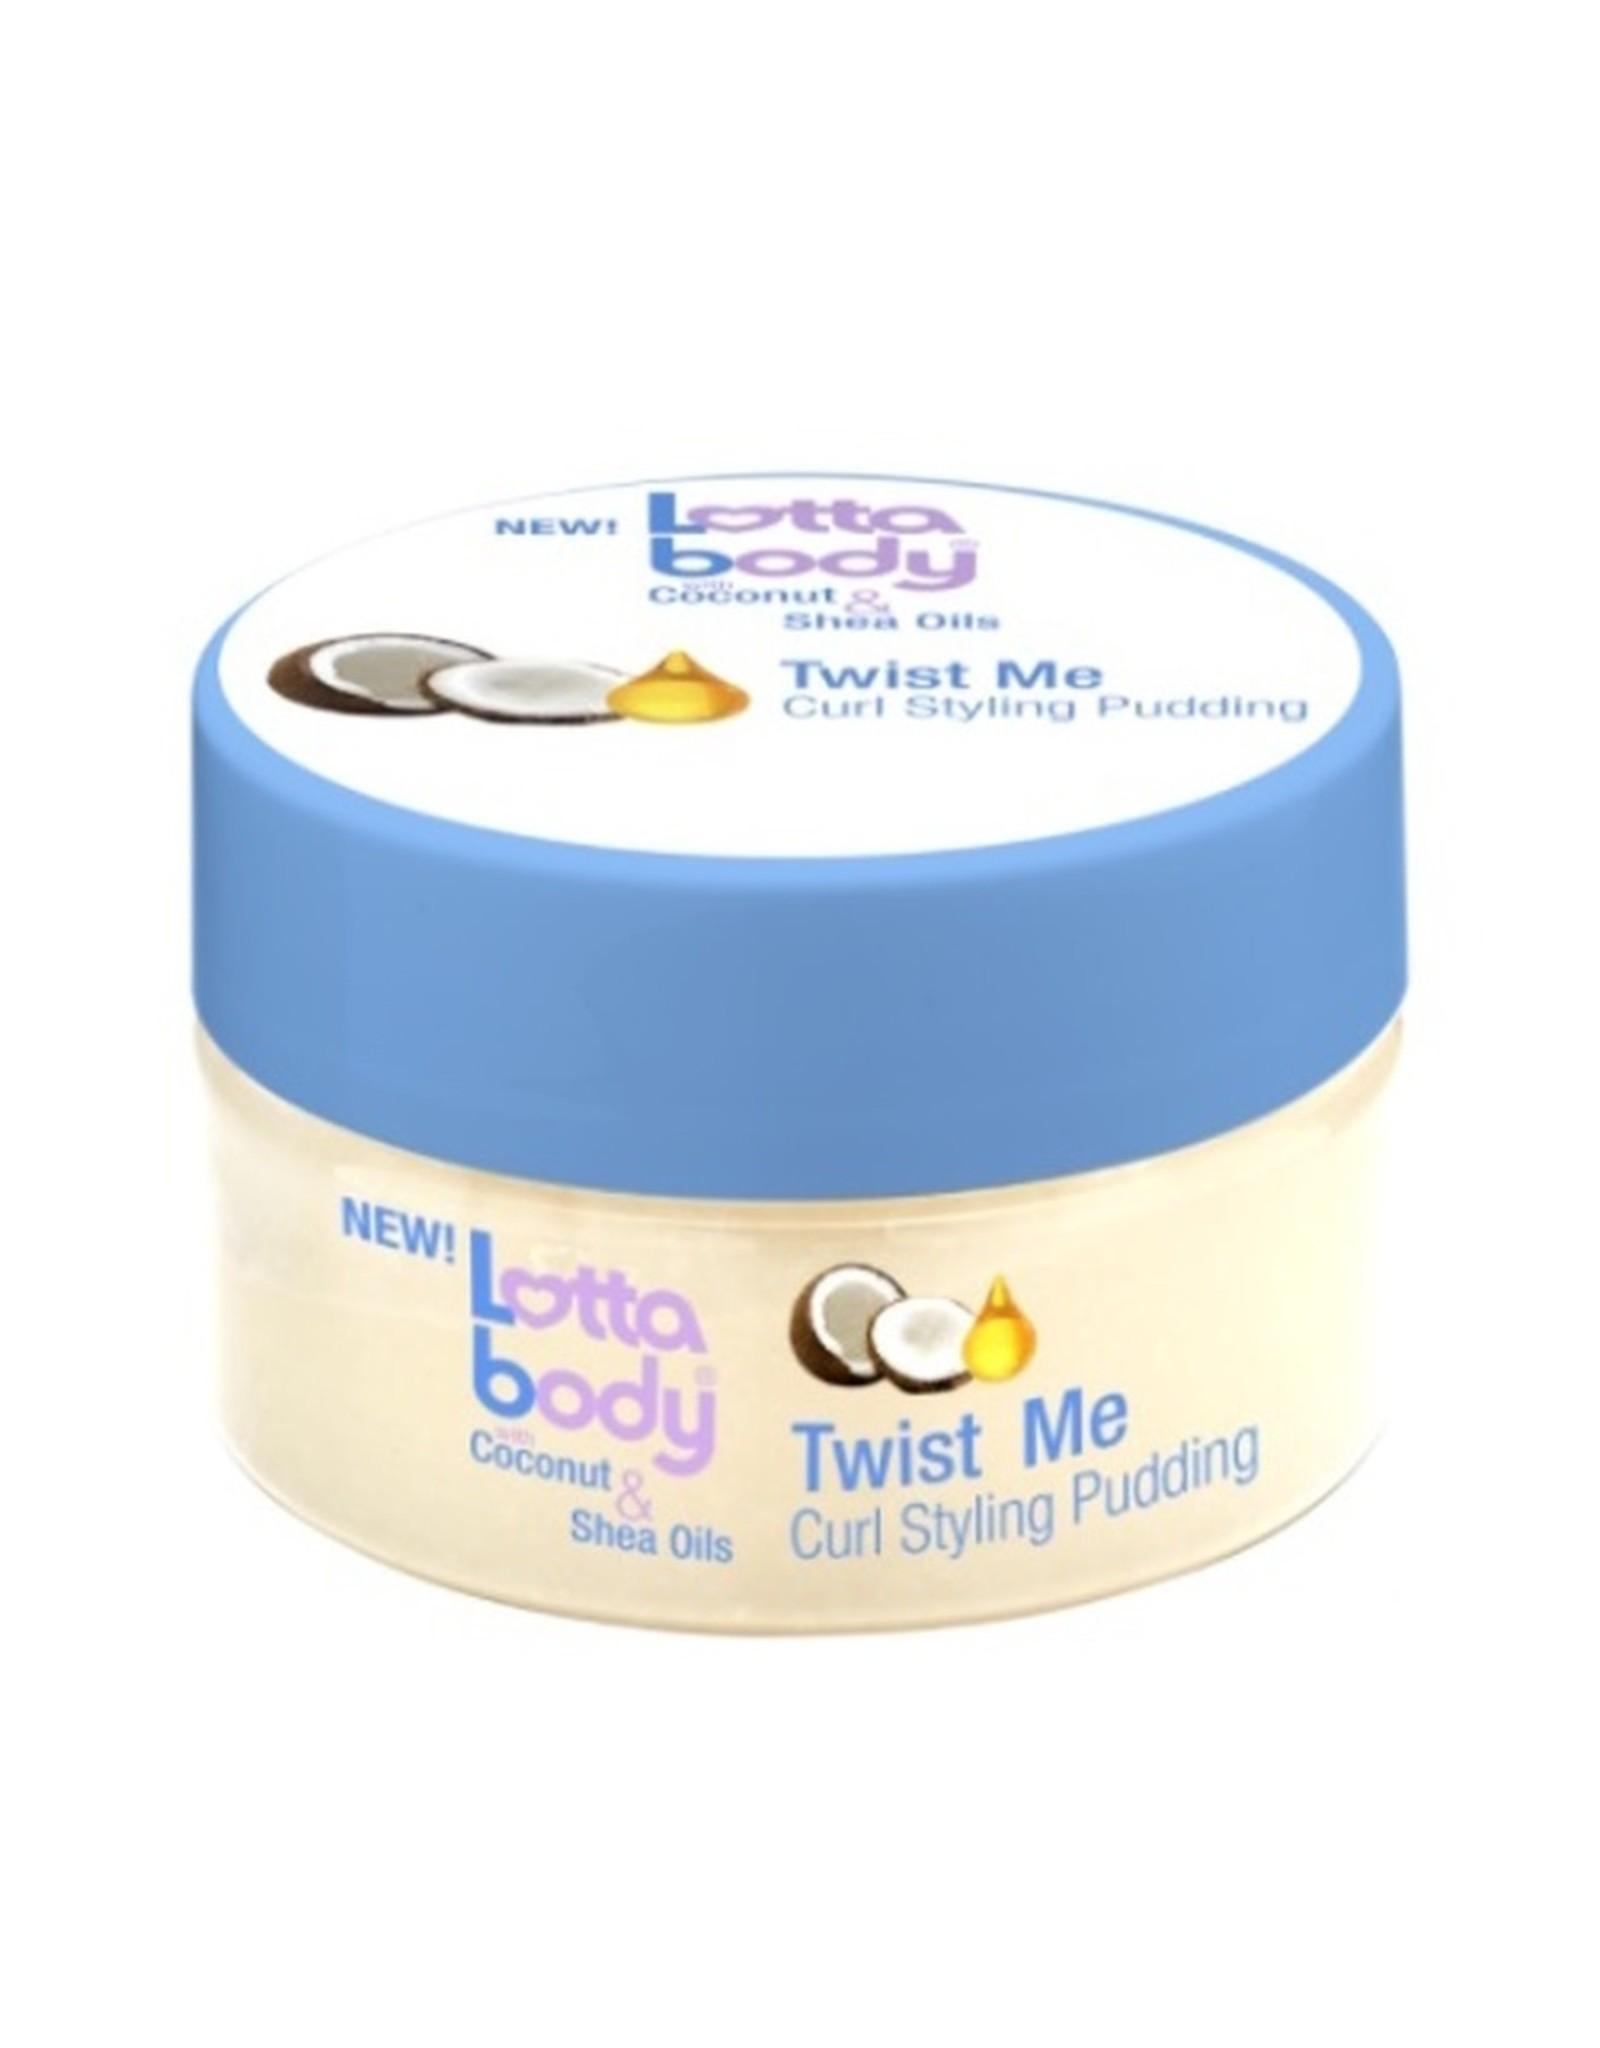 Lotta Body Twist Me Curl Styling Pudding